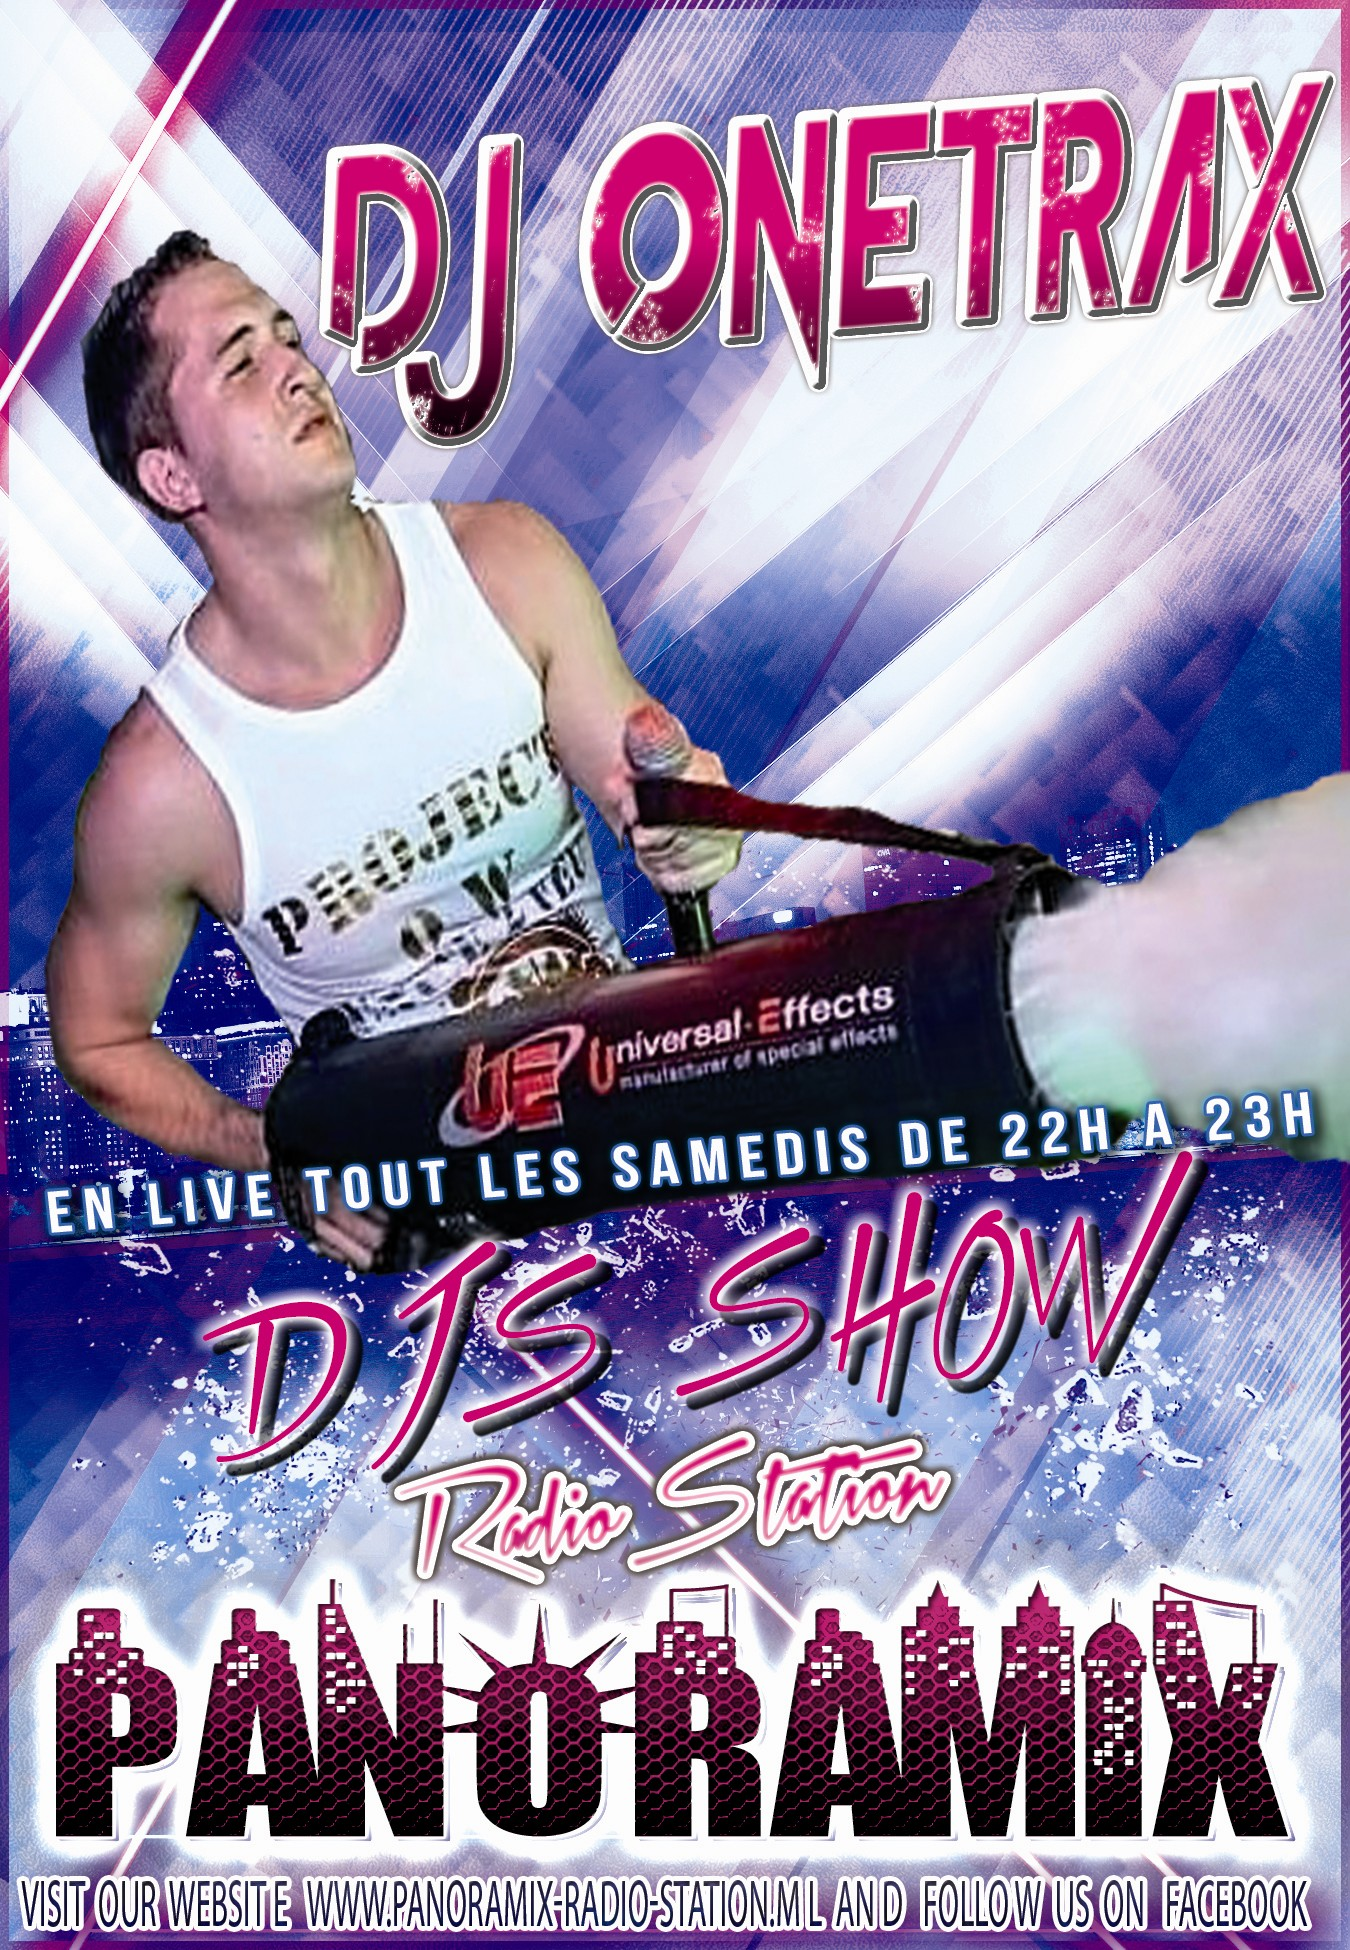 http://panoramix-radio-station.com/wp-content/uploads/2016/12/DJ-ONETRAX-DJ-SHOW-PANORAMIX-AFFICHE.jpg